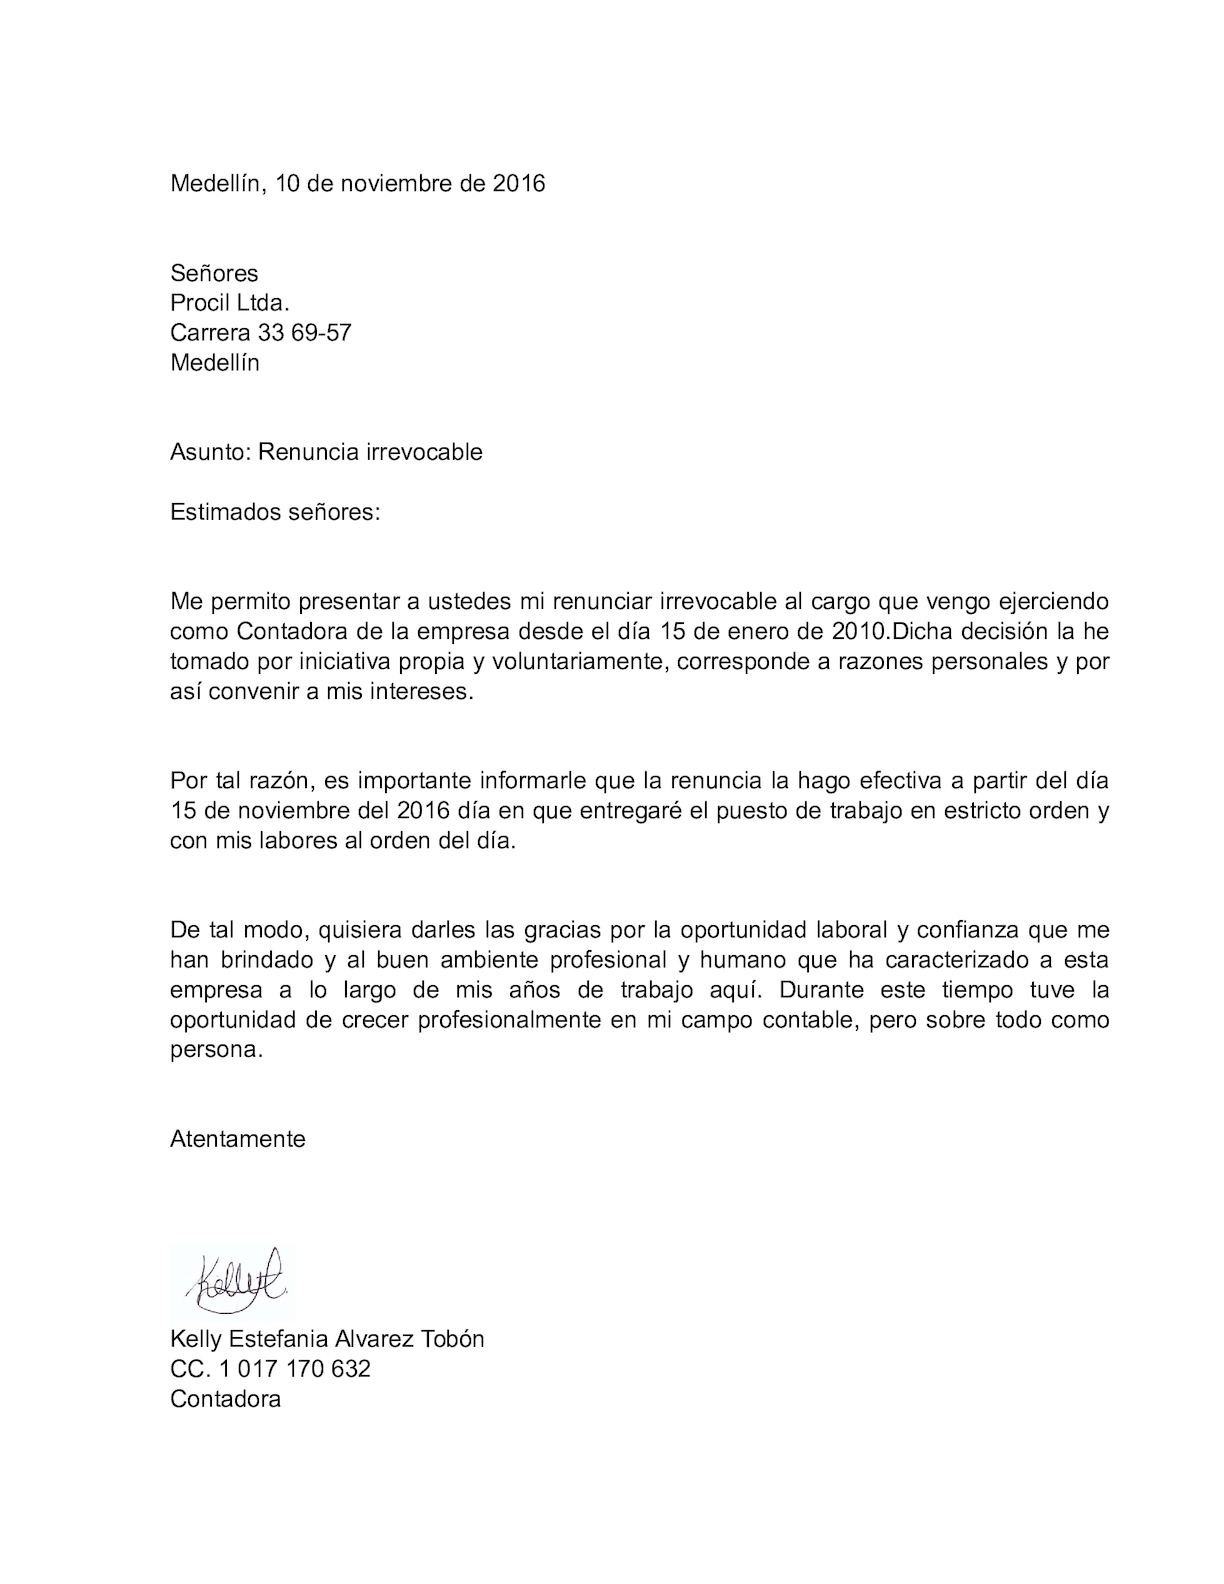 Carta Renuncia Irrevocable Calameo Downloader